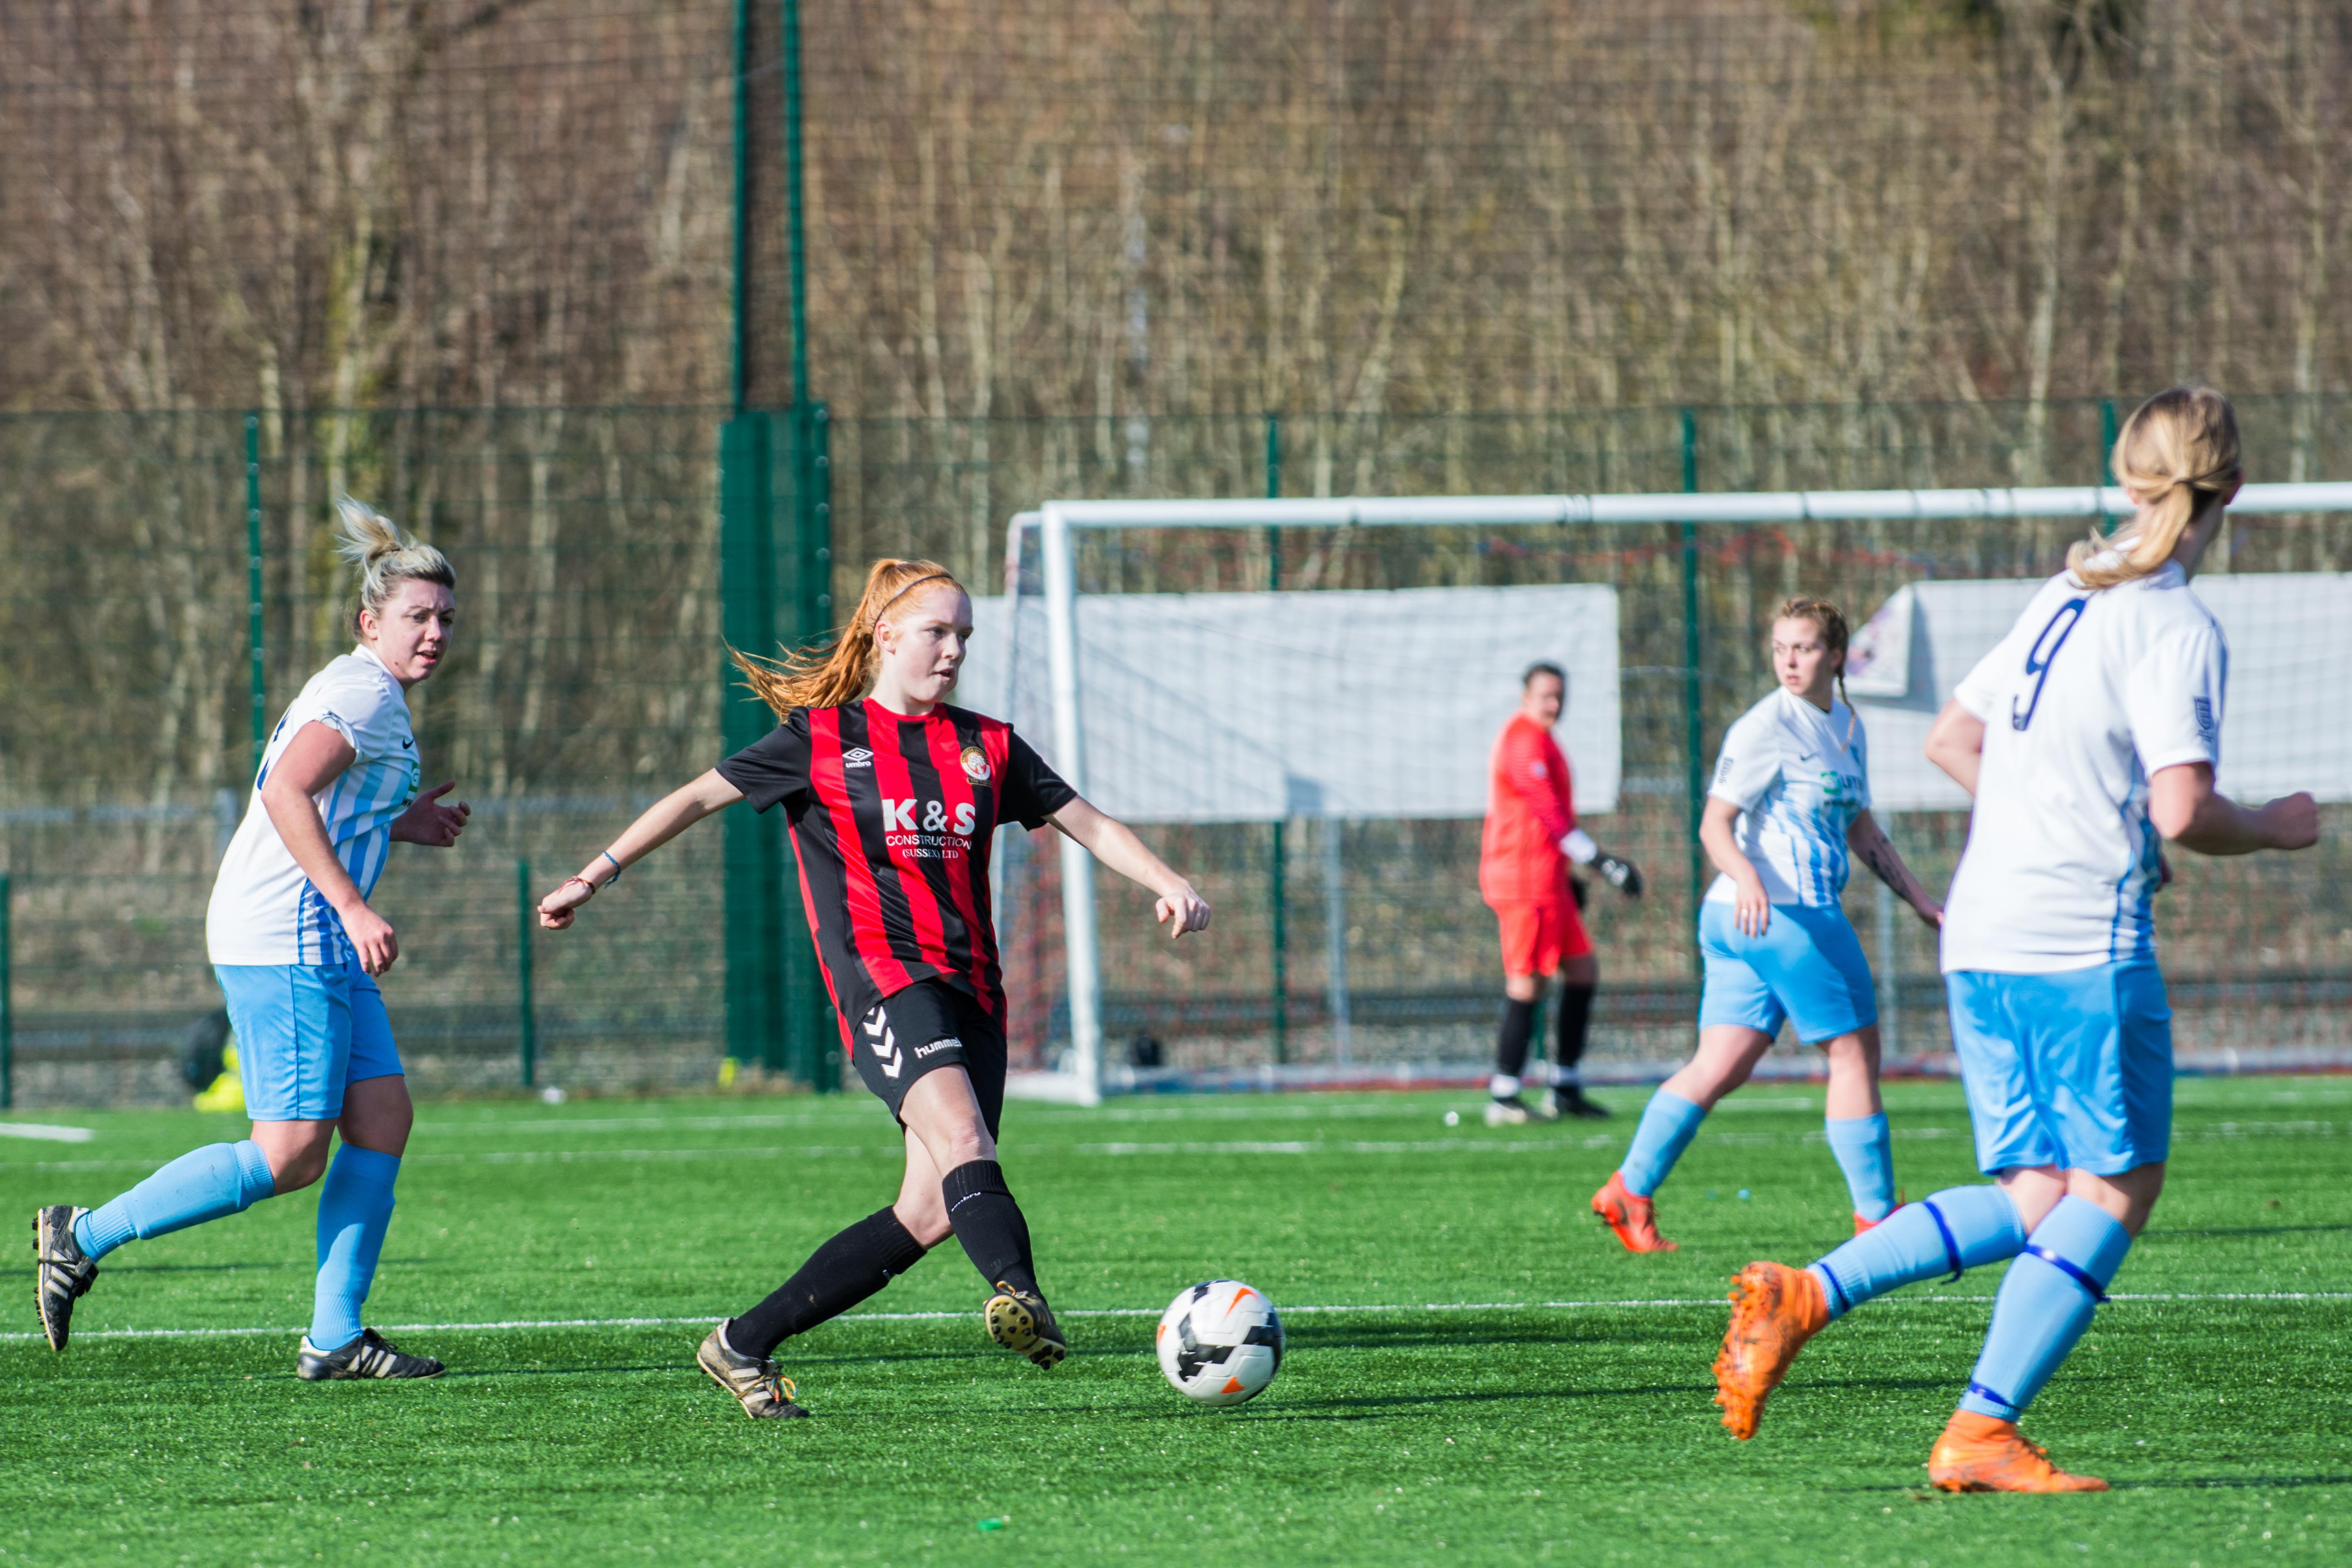 DAVID_JEFFERY Saltdean Utd Ladies FC vs Worthing Utd Ladies FC 11.03.18 24